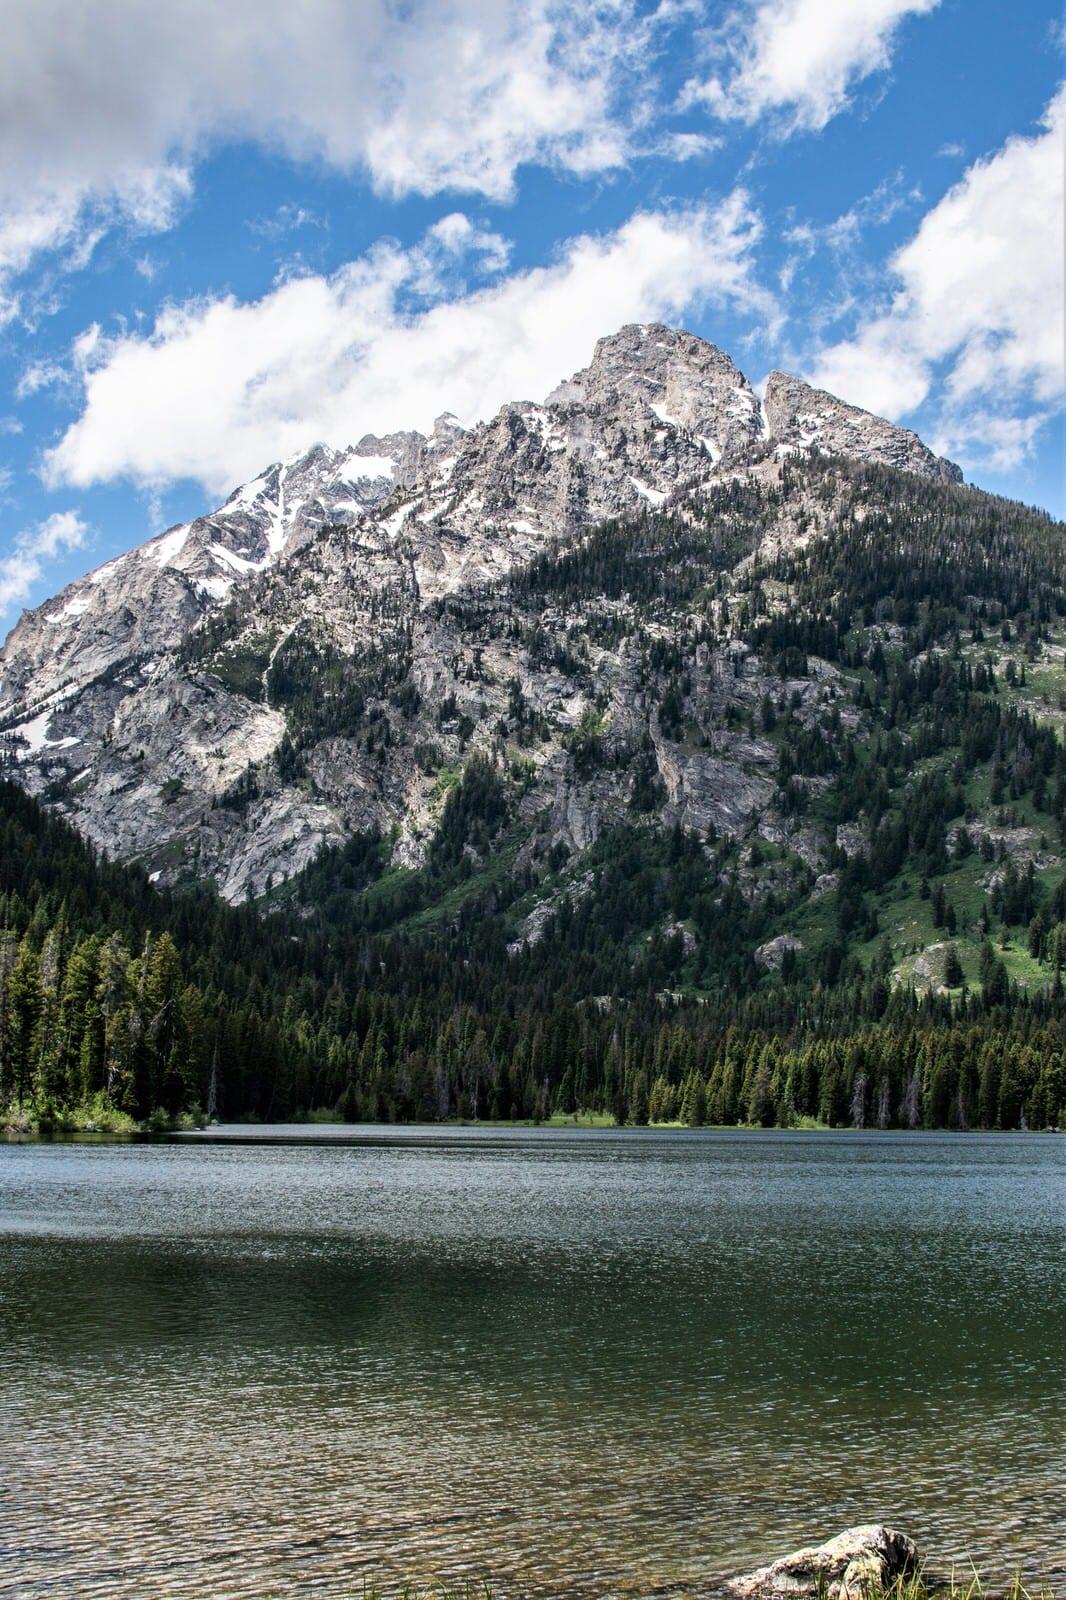 Annie Explore - Taggart Lake